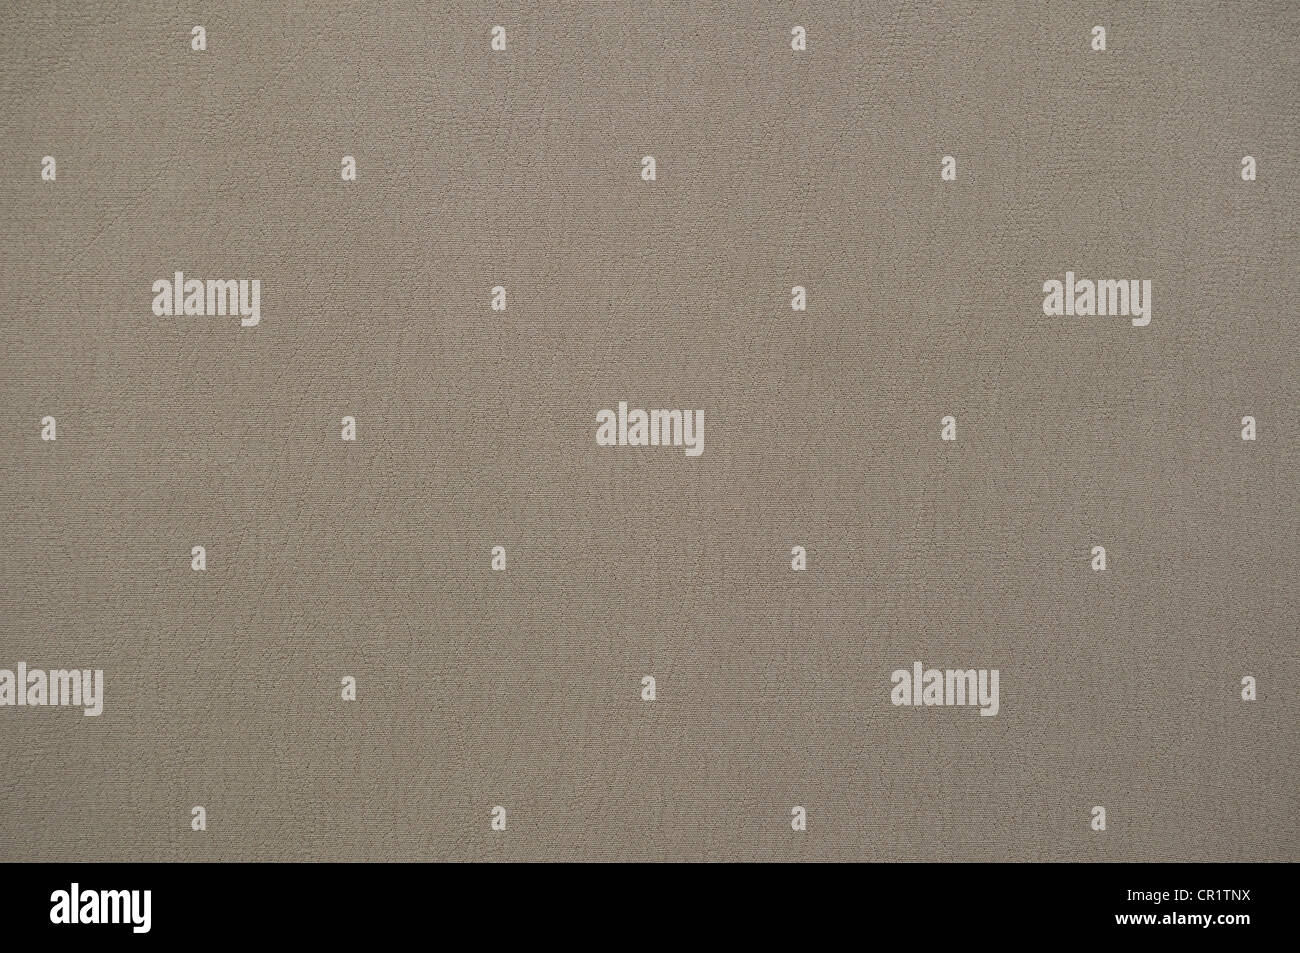 Drape background of gray crushed silk - Stock Image